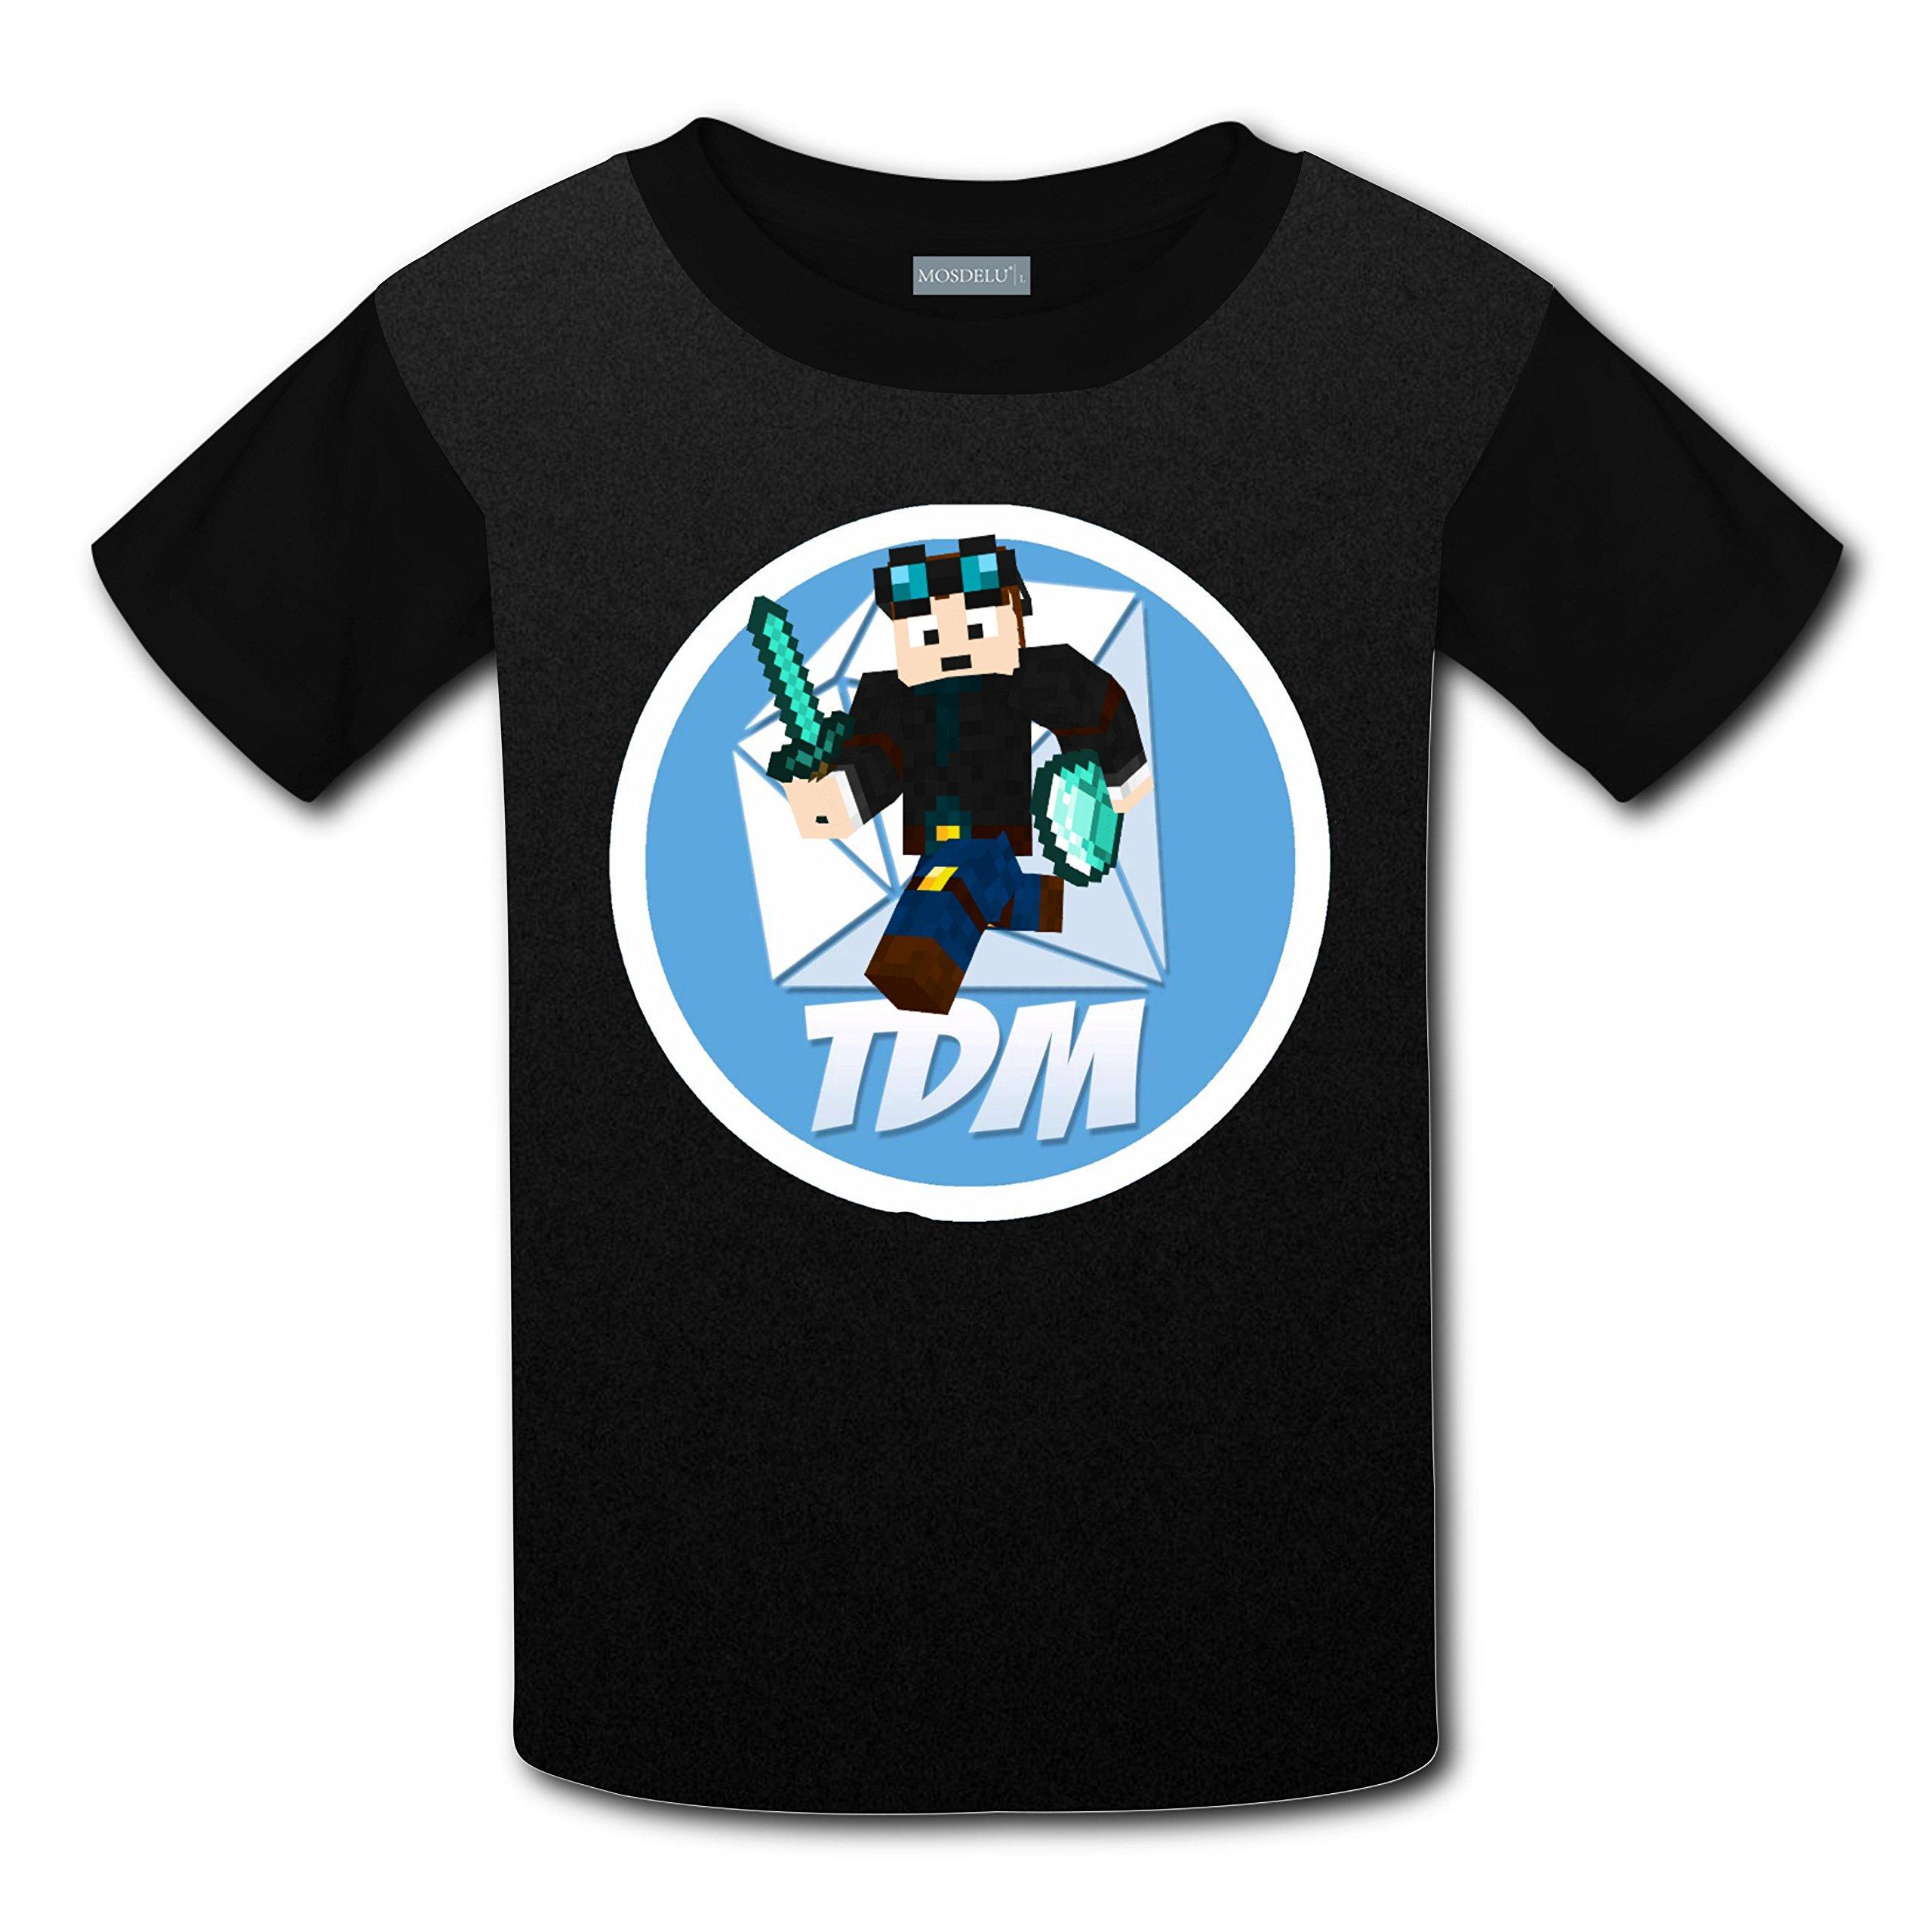 The Diamond Minecart TDM Logo 3D Printed Short Sleeve Crew Neck T-Shirt For Boys by BIBIVE